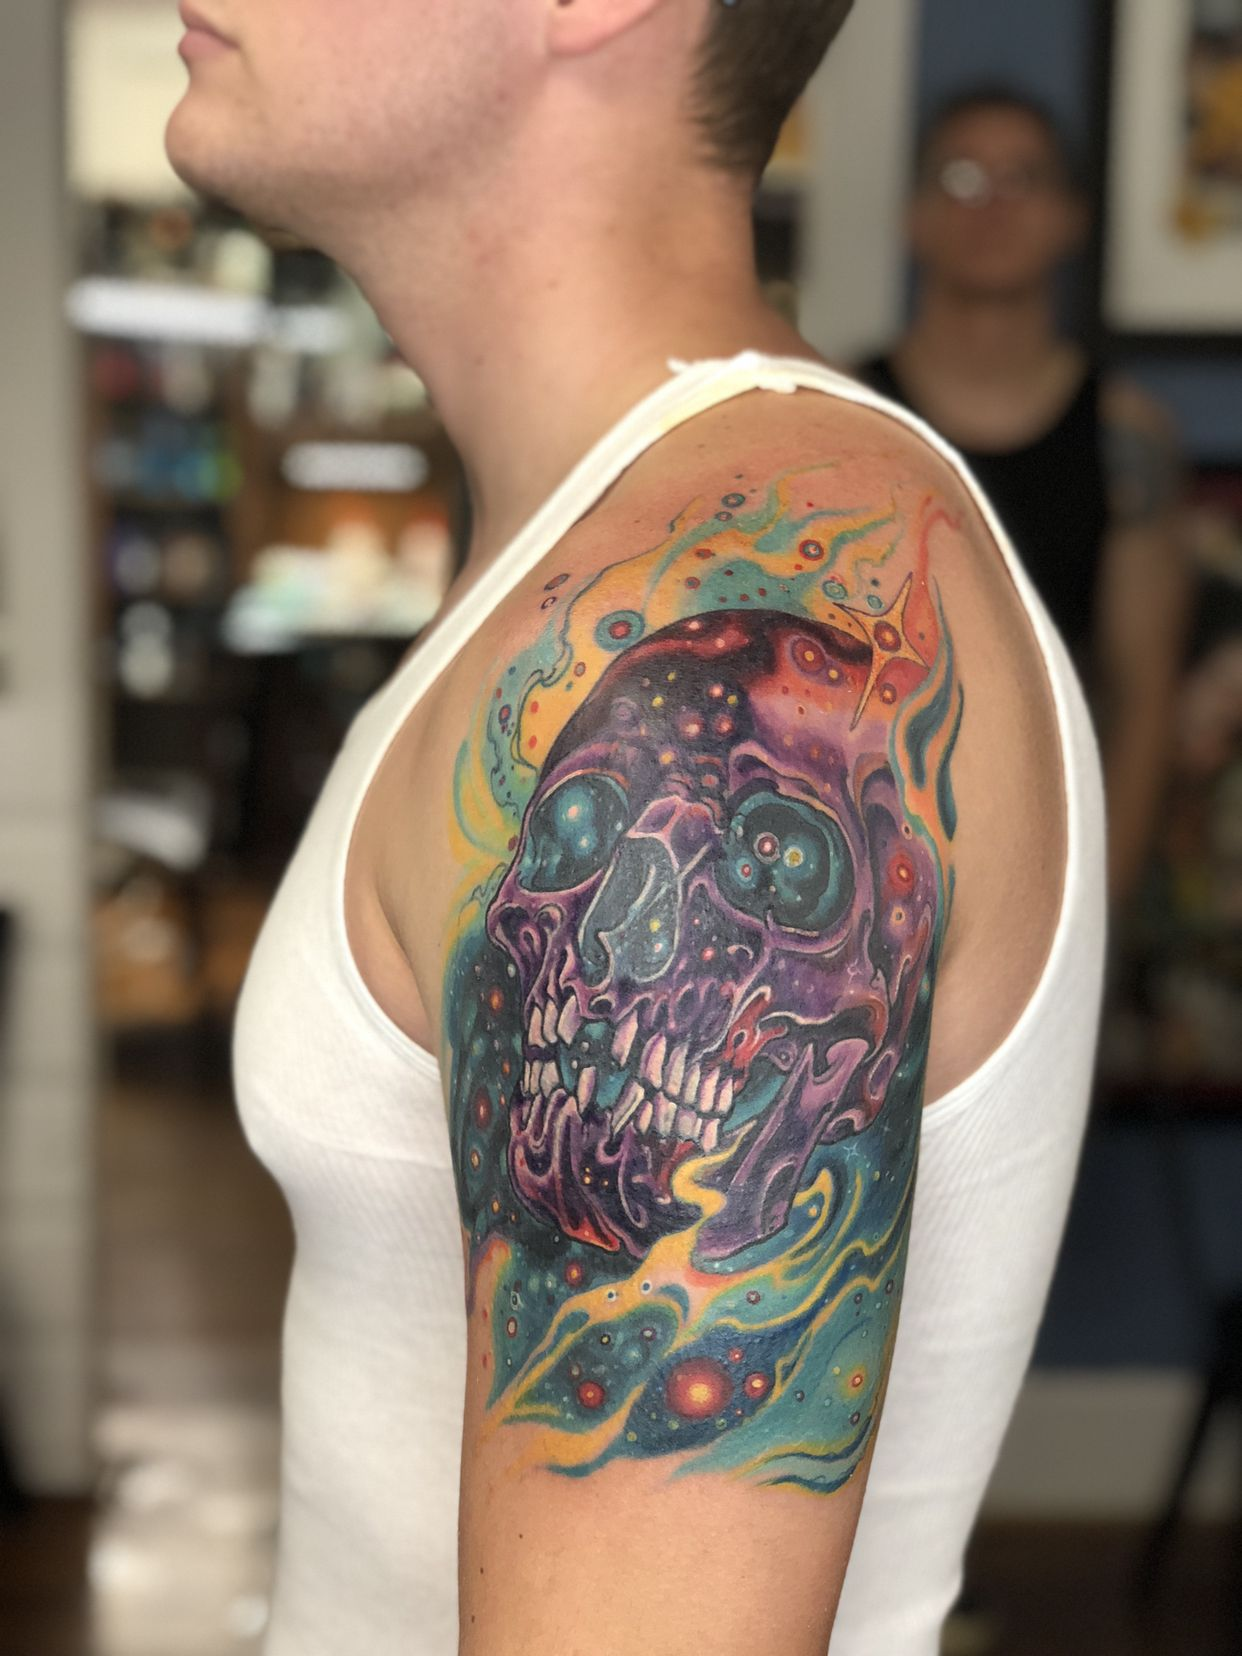 Nebula skull covering up old tribal tattoo tattoos